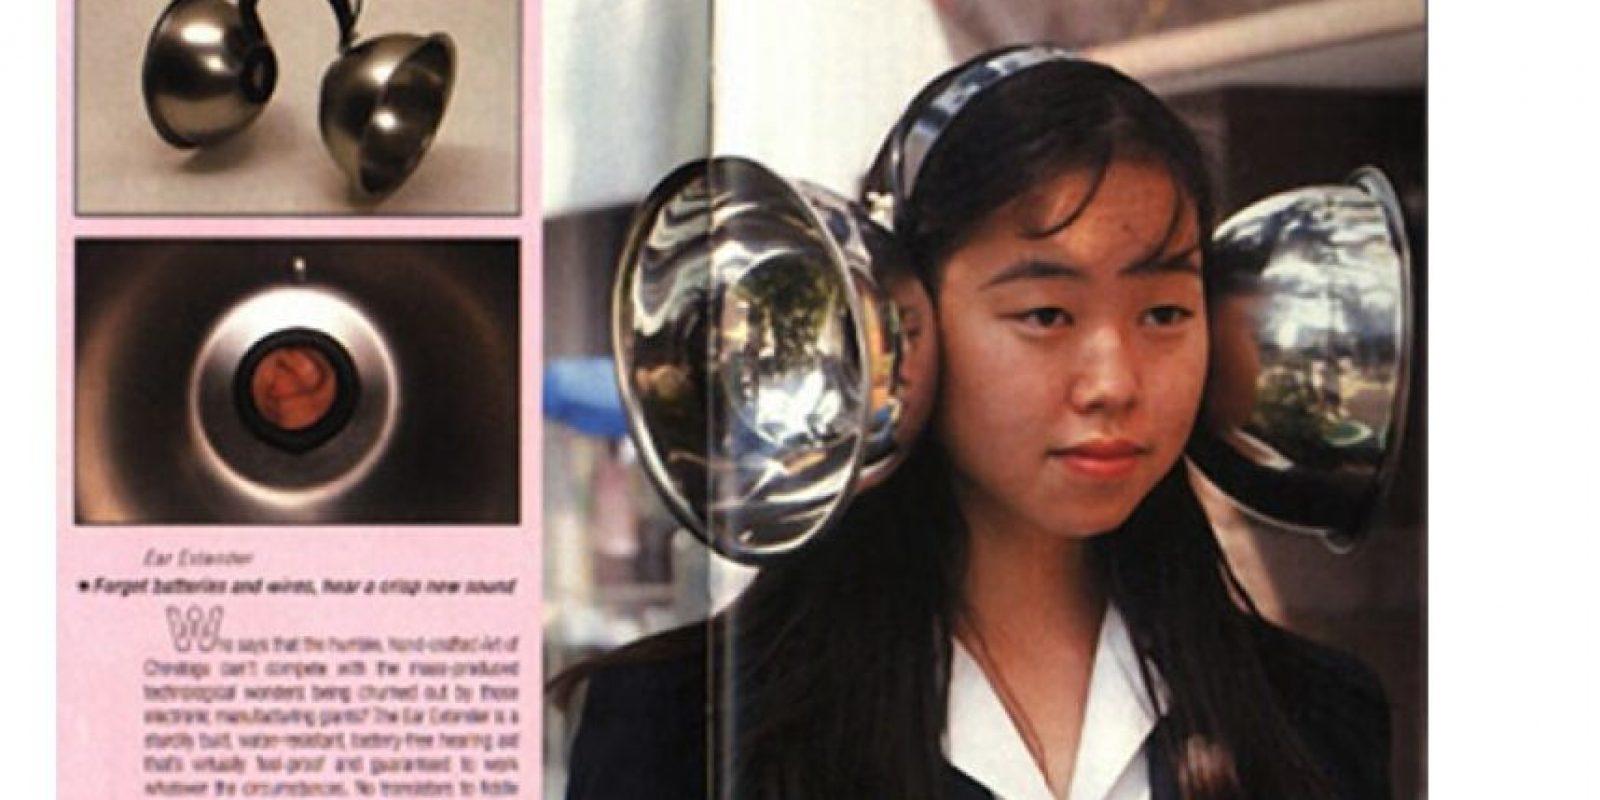 Este extensor auricular Foto:Oddee